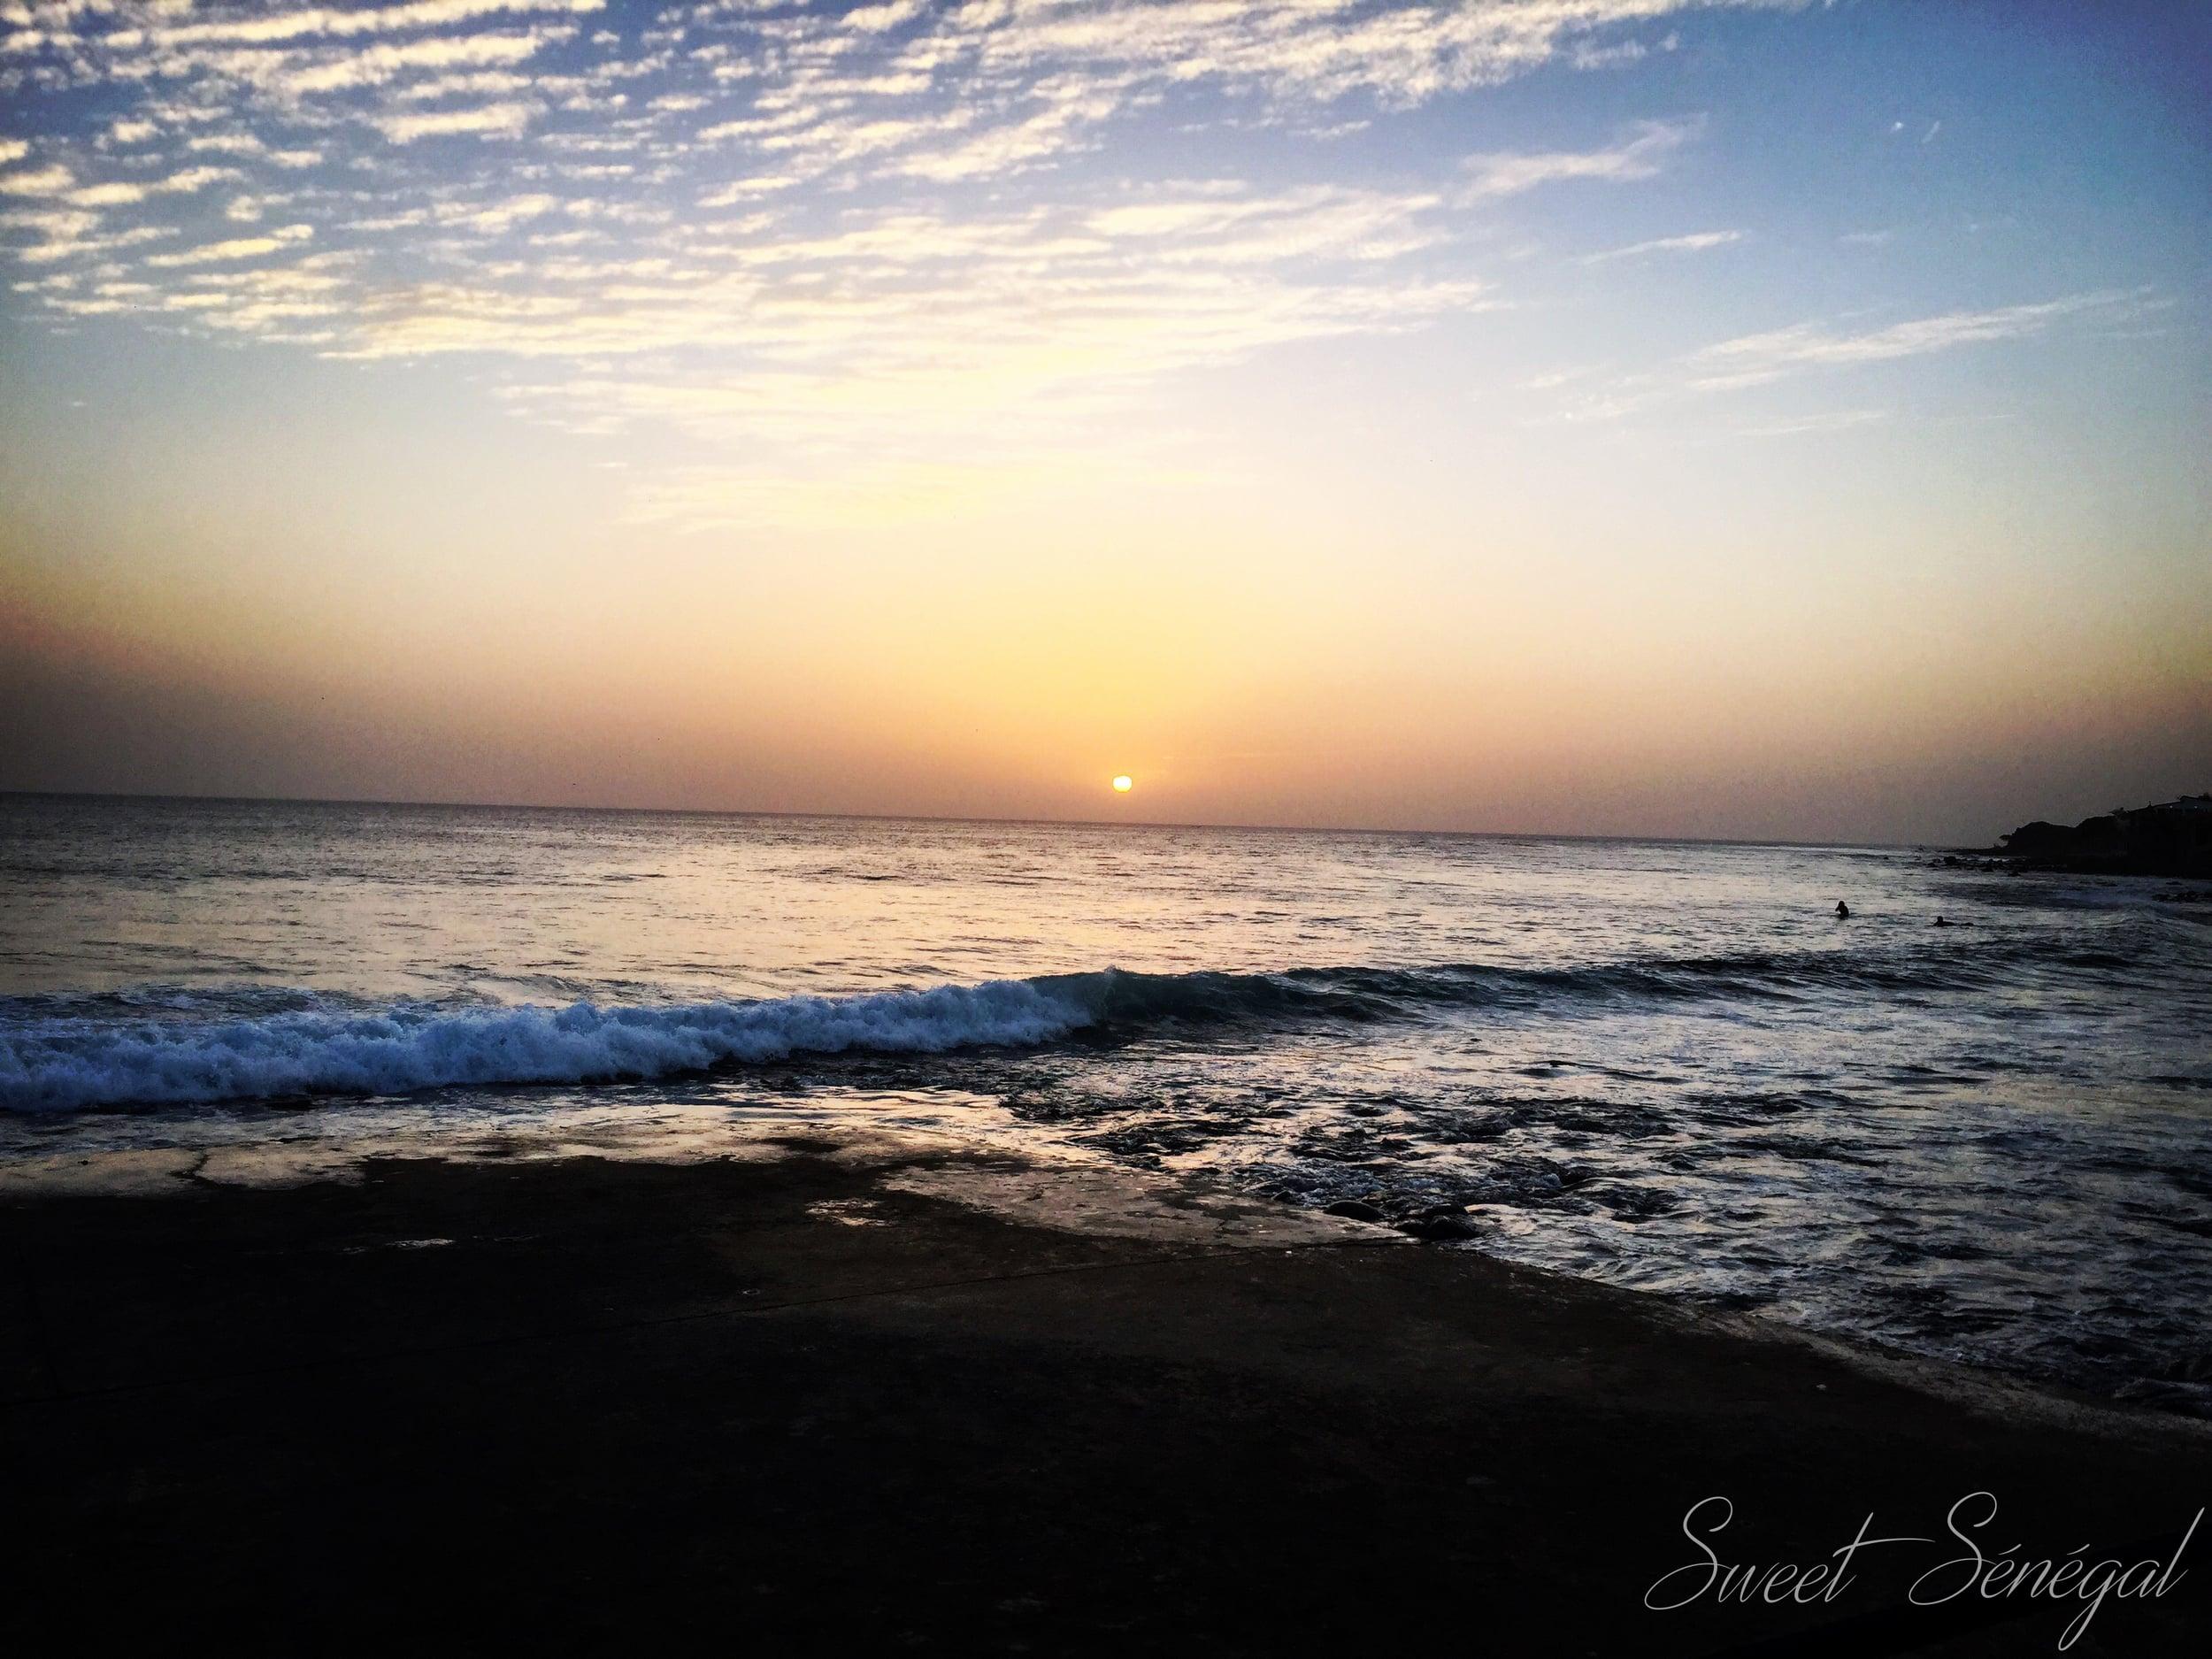 Corniches des almadies Photo: Sweet Senegal